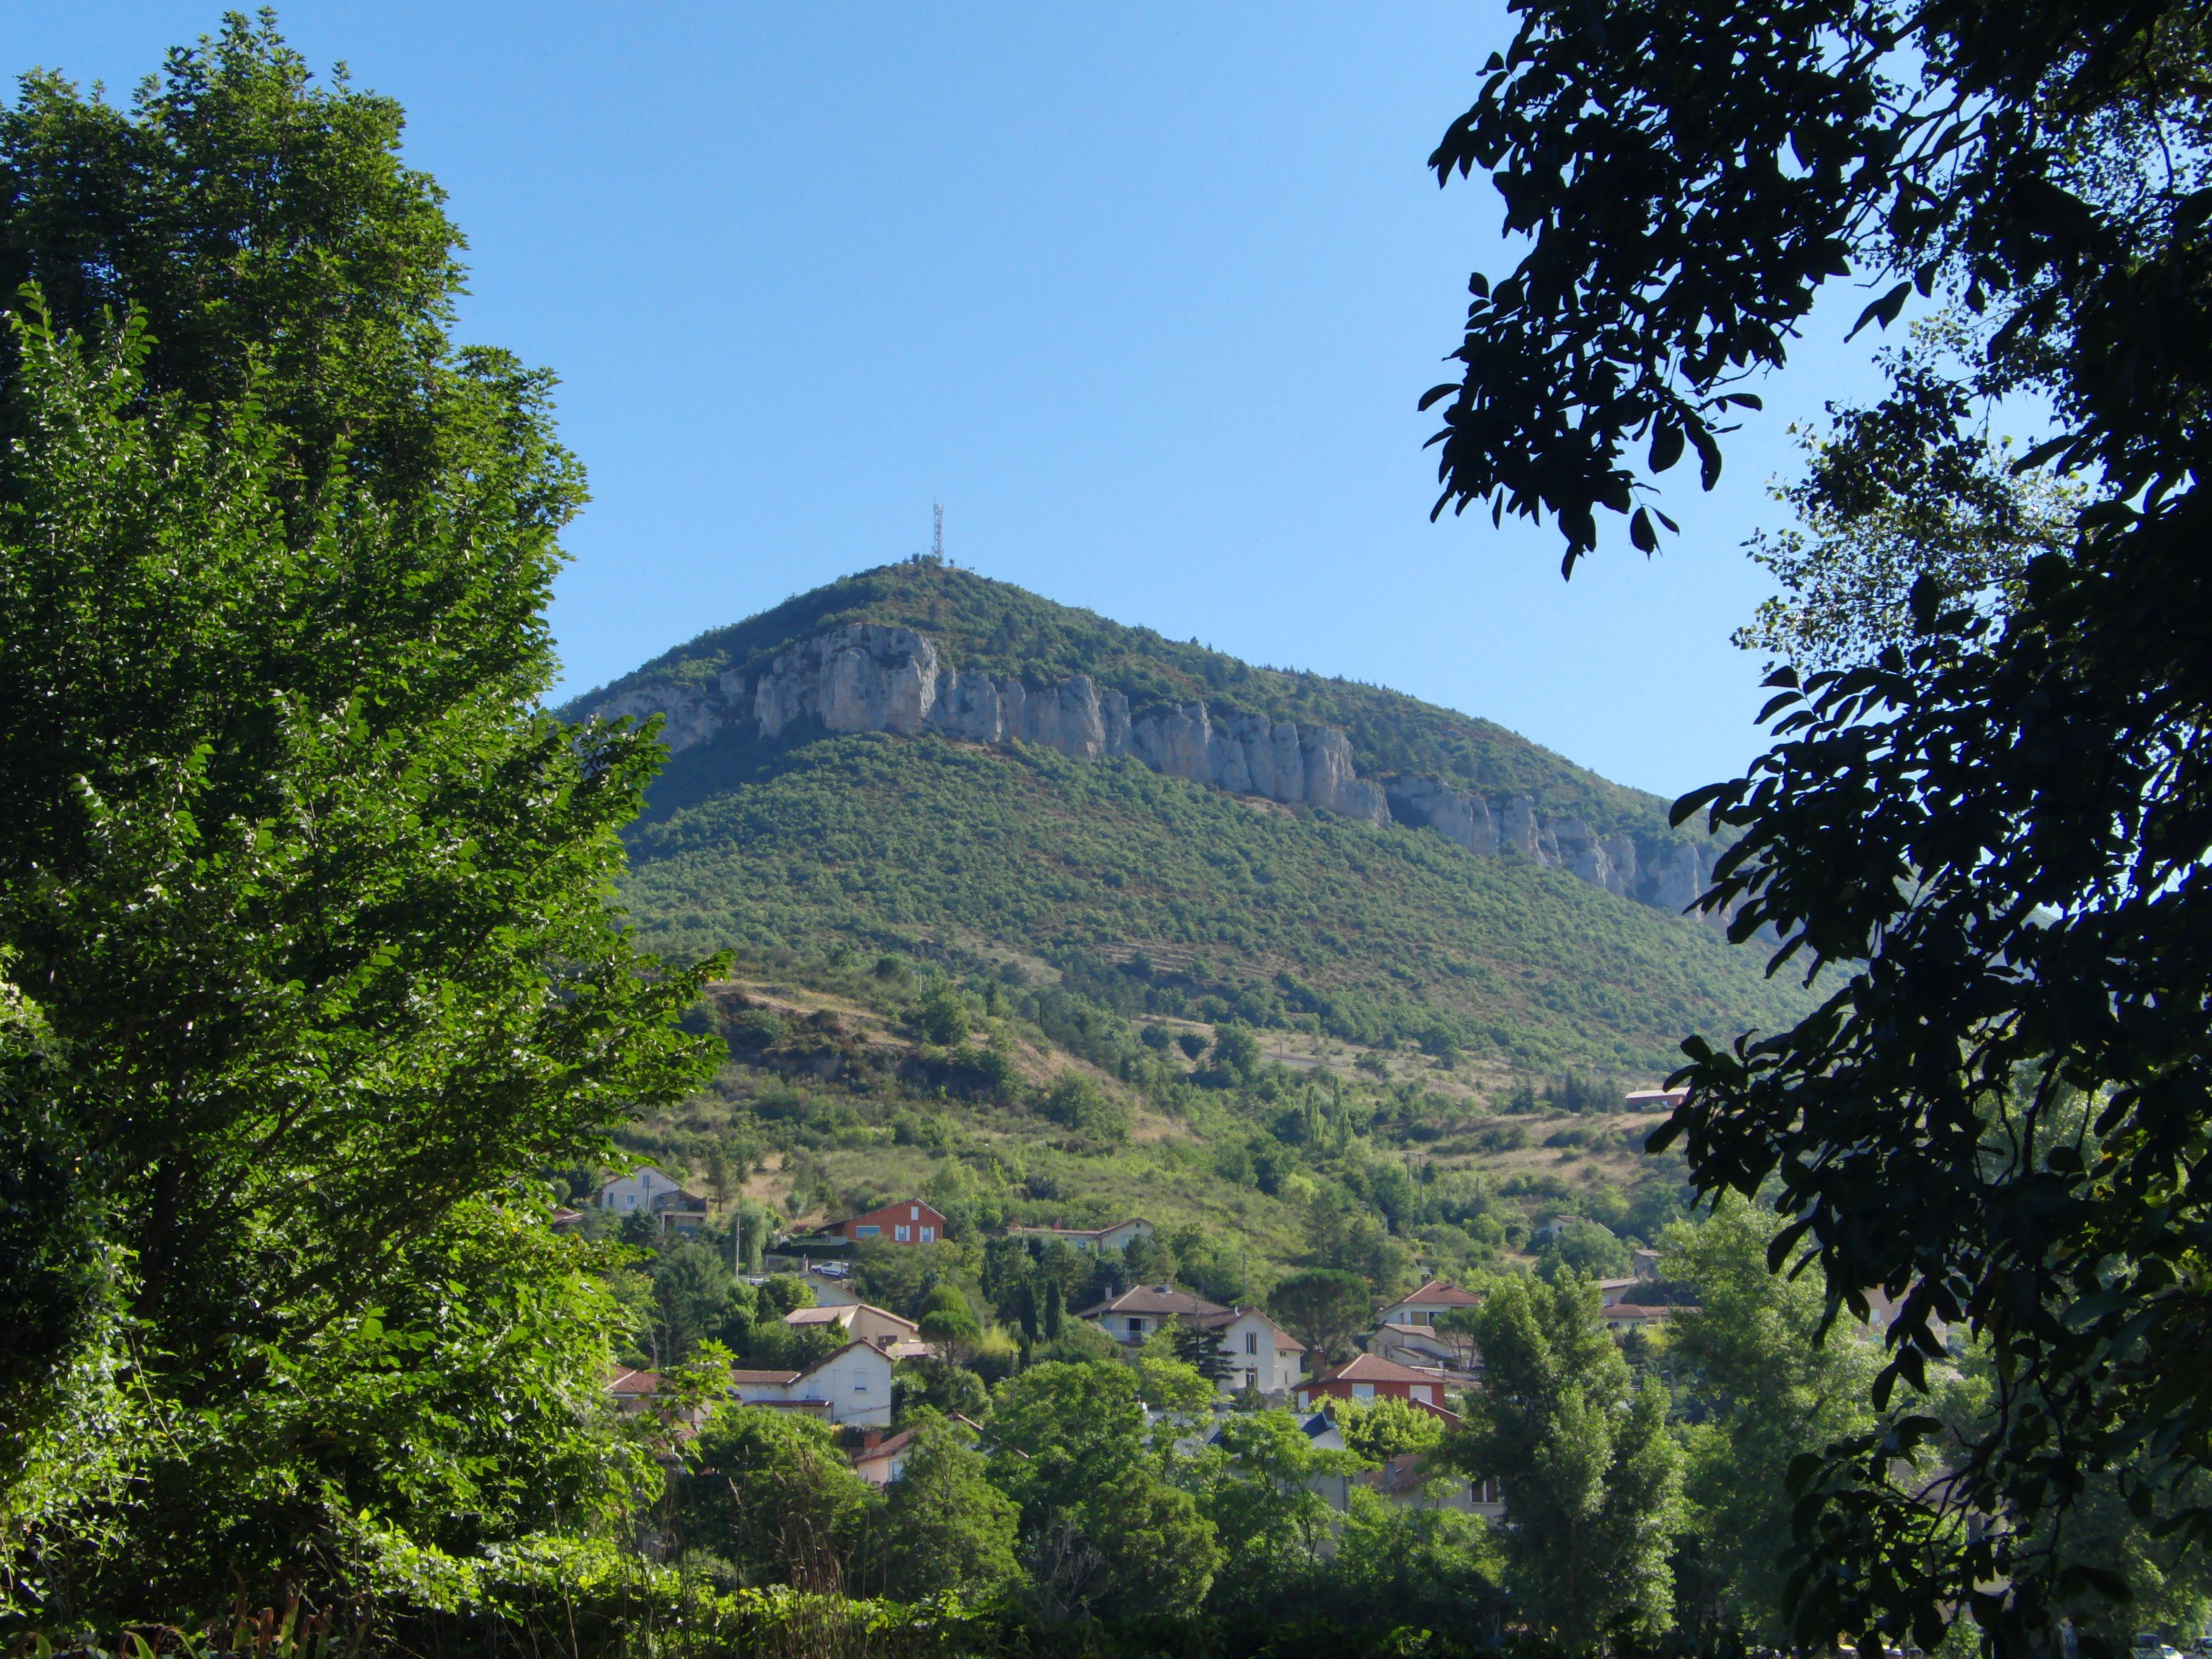 Camping Huttopia Millau (Côté Sud), Millau, Aveyron